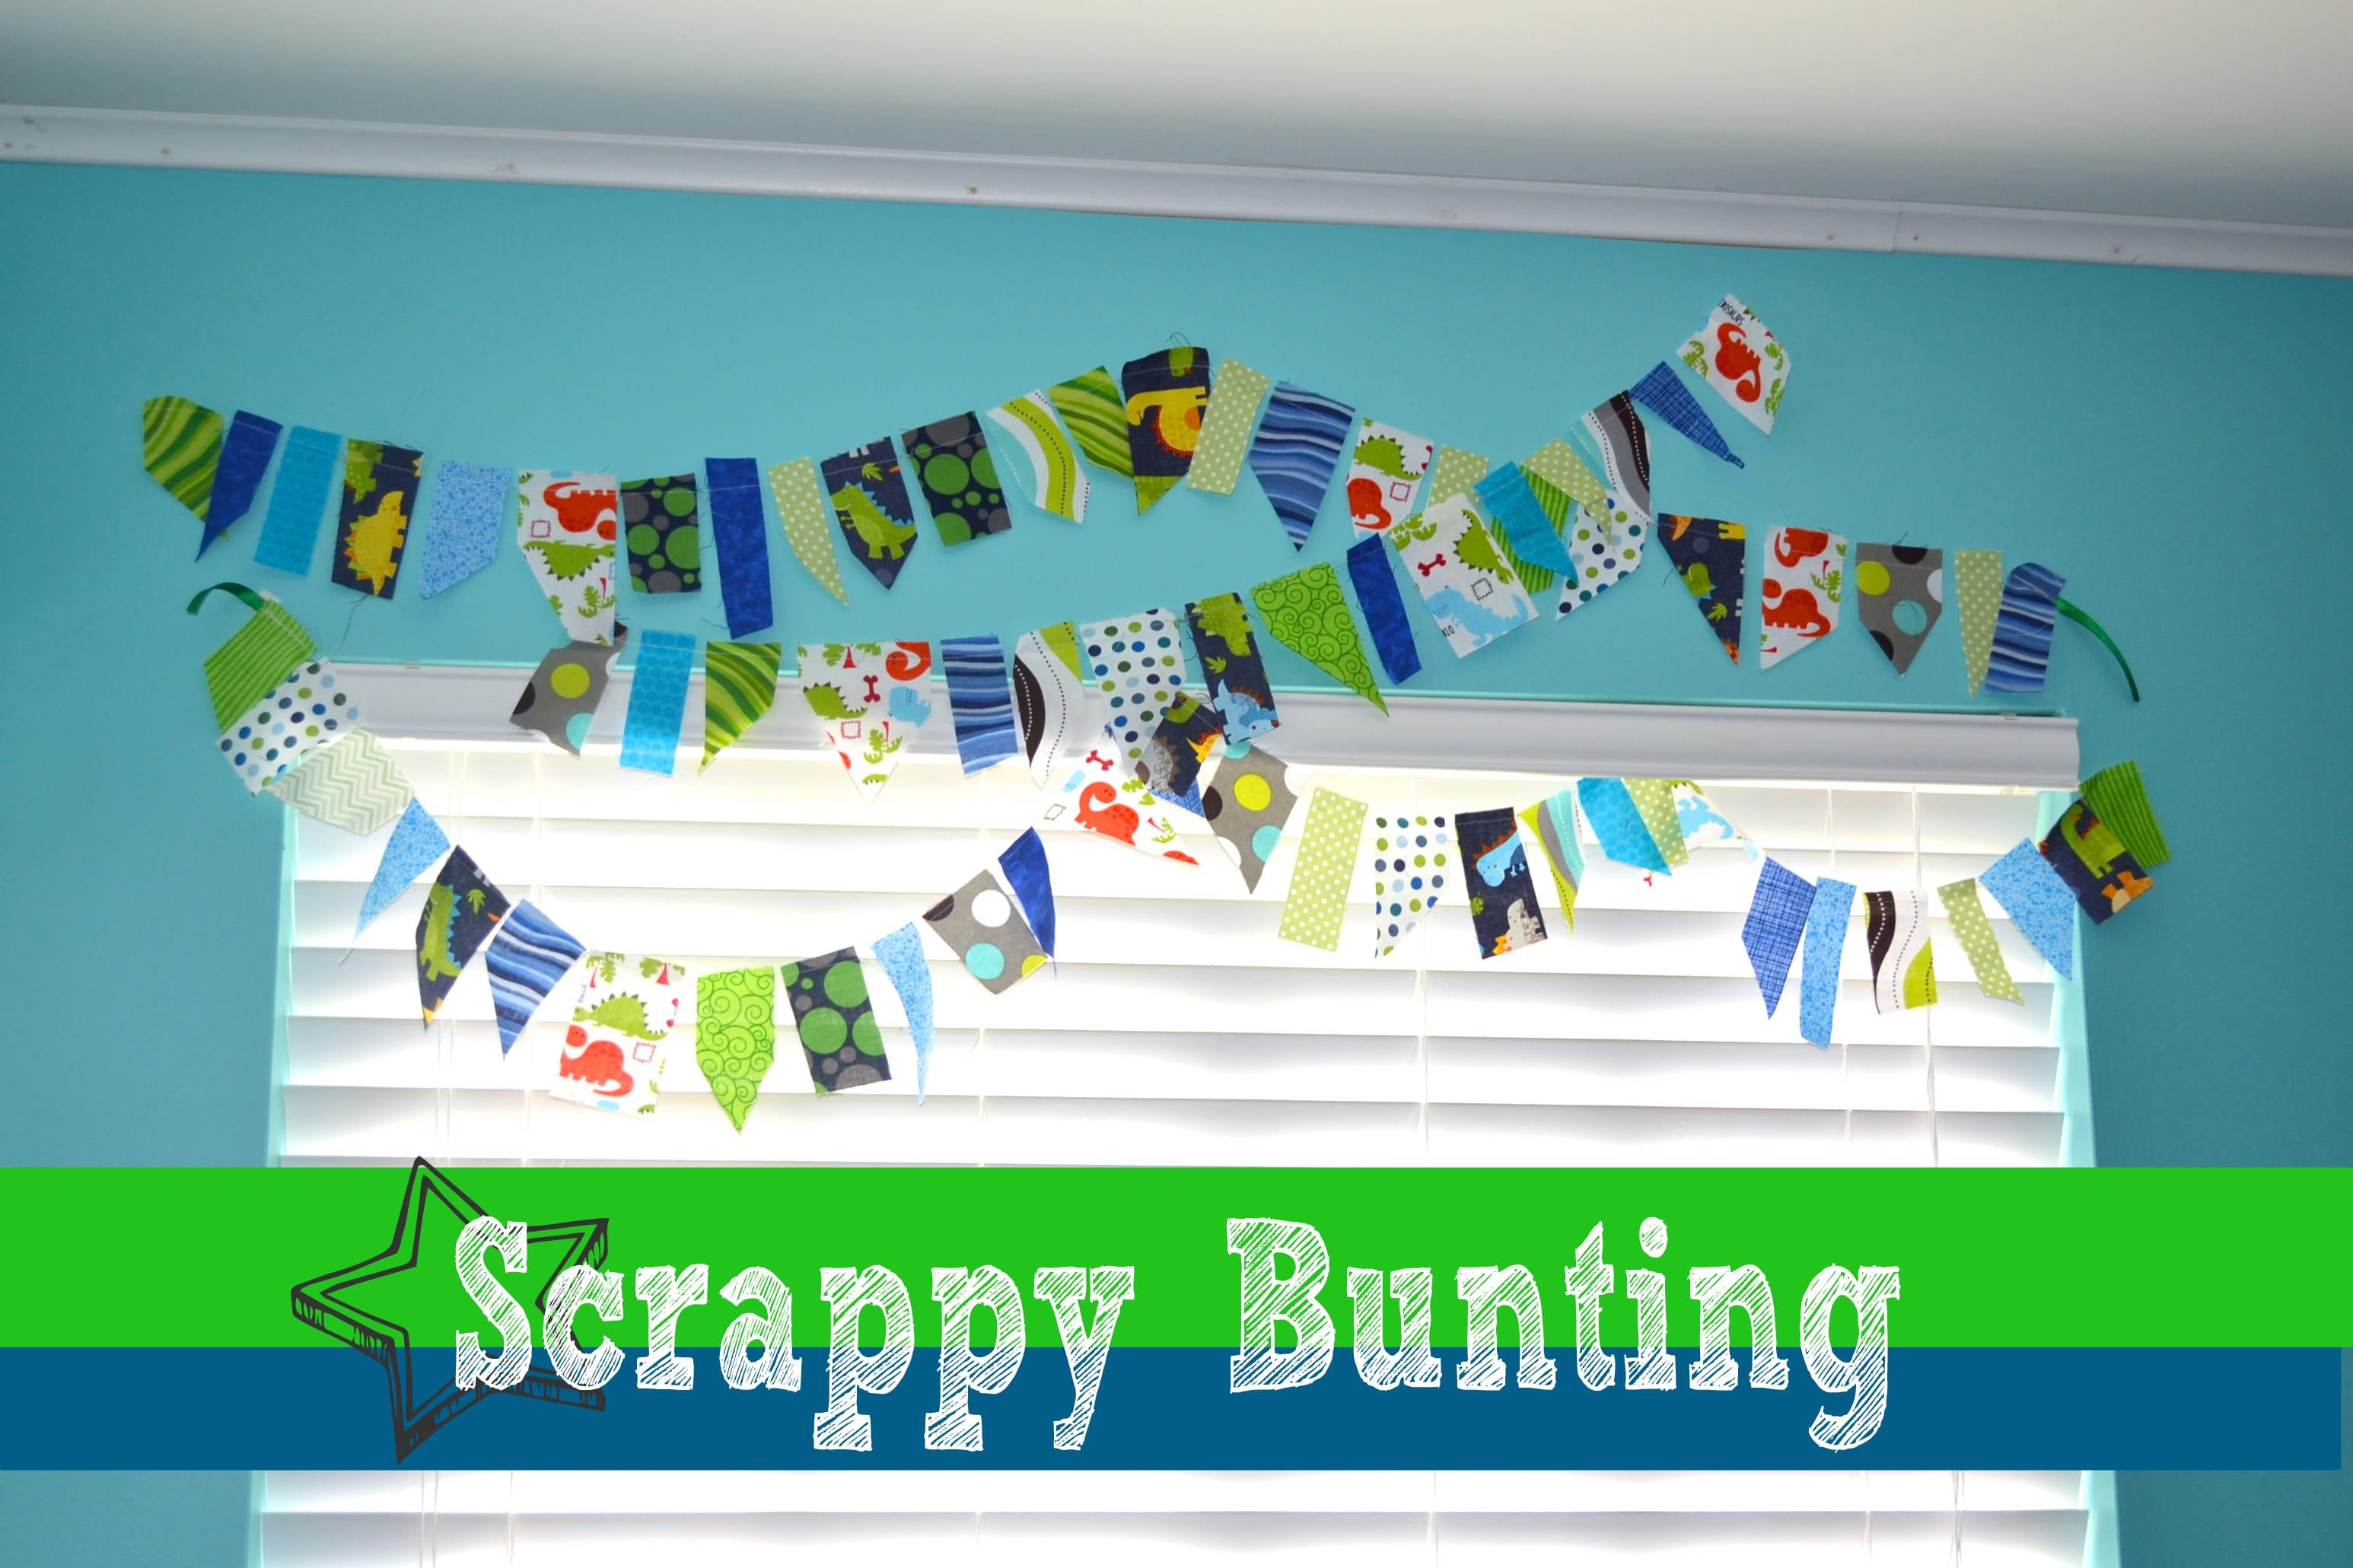 Scrappy Bunting